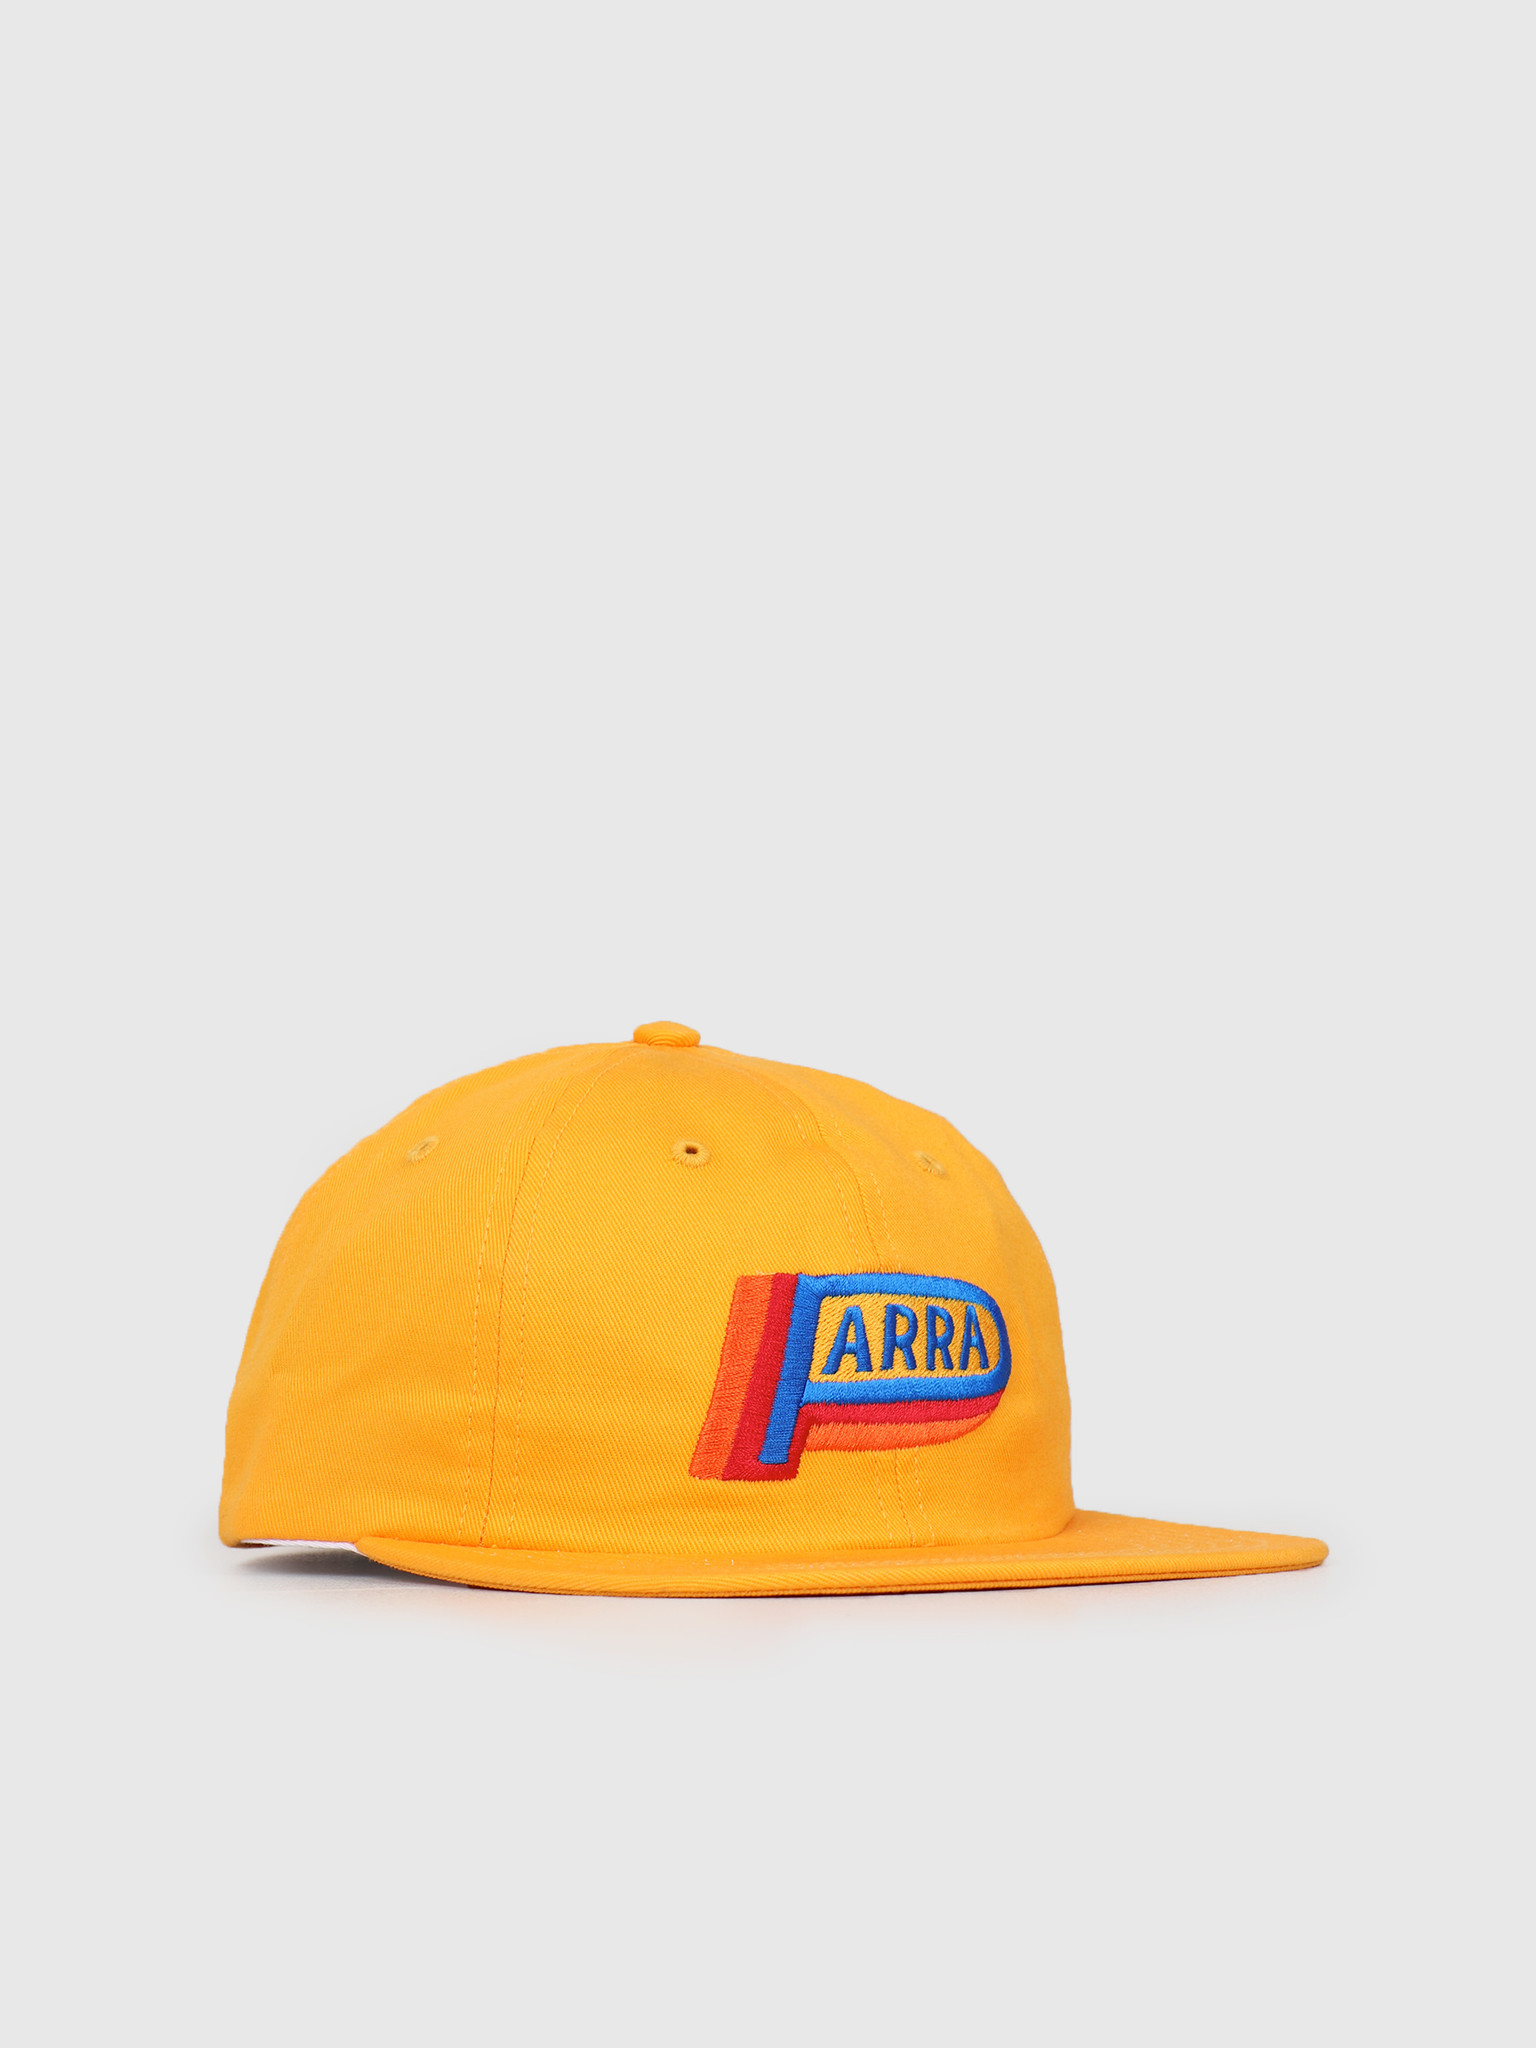 By Parra 6 Panel Hat Garage Oil Gold Yellow 42330 - FRESHCOTTON 7996177d3fbd